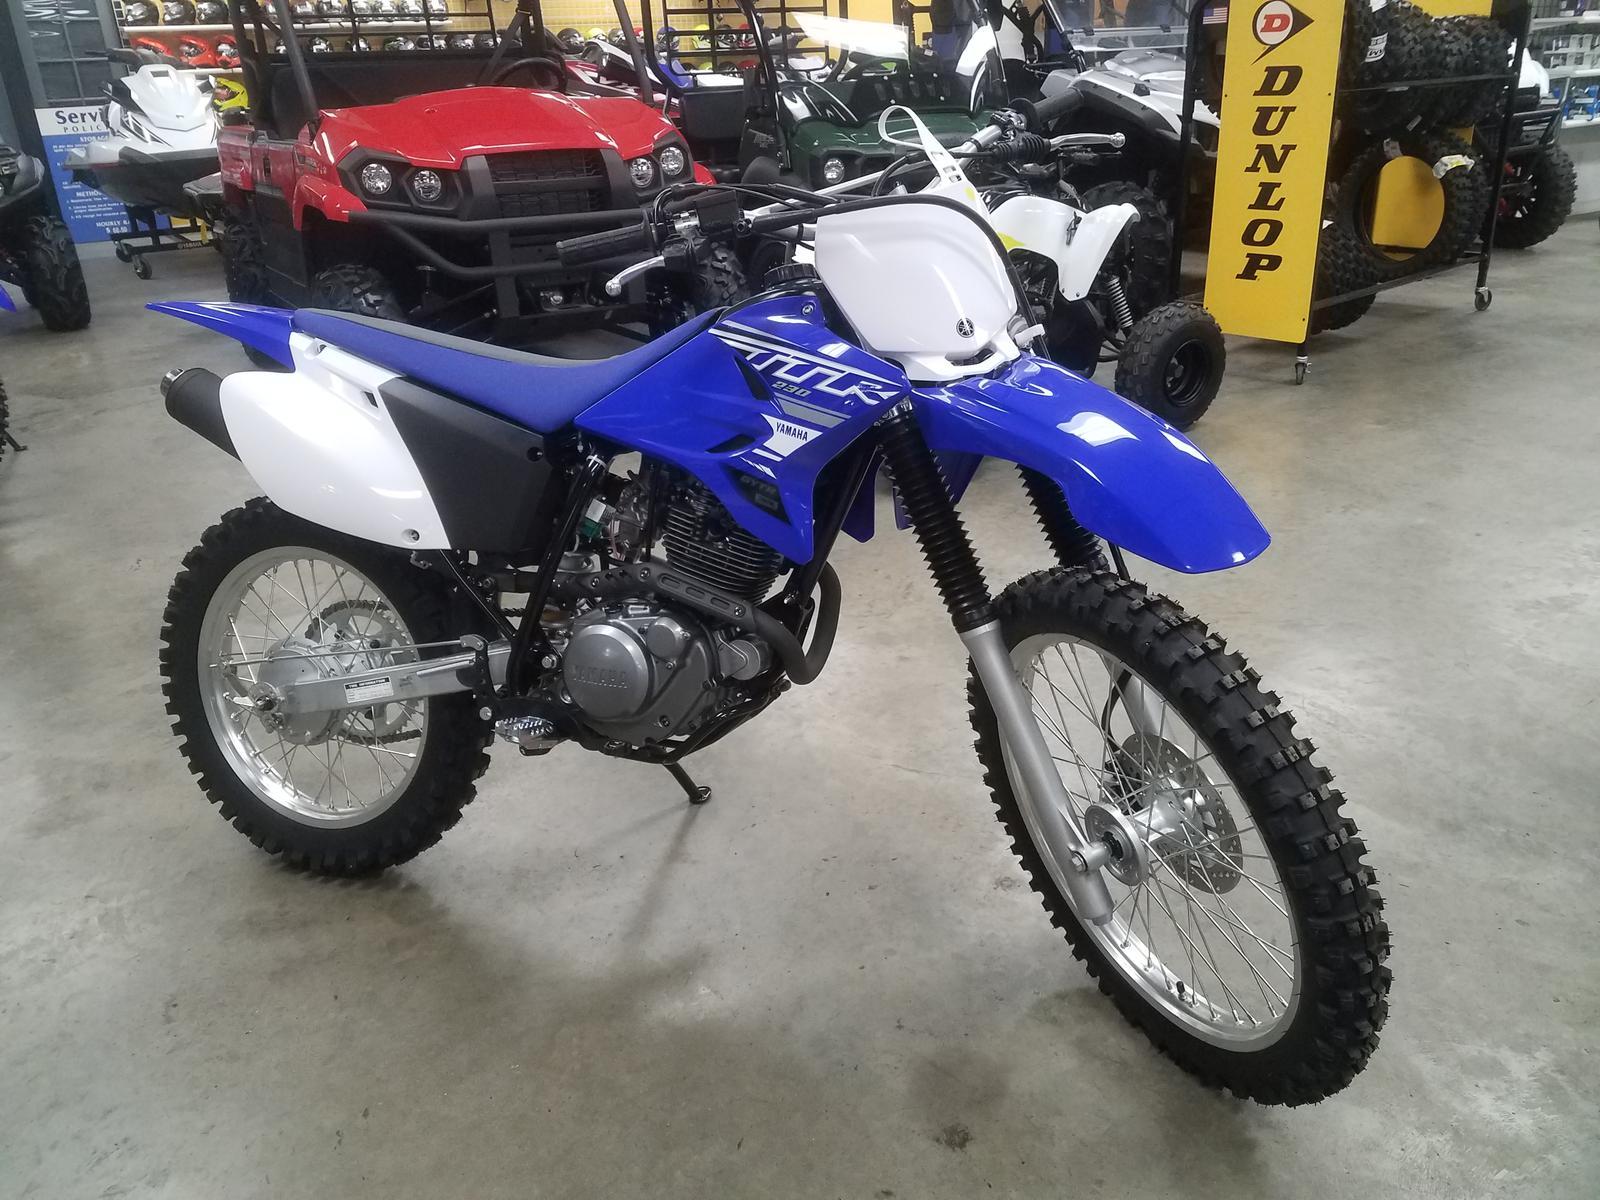 2019 Yamaha Tt R230 For Sale In Herrin Il Good Guys Motorsports